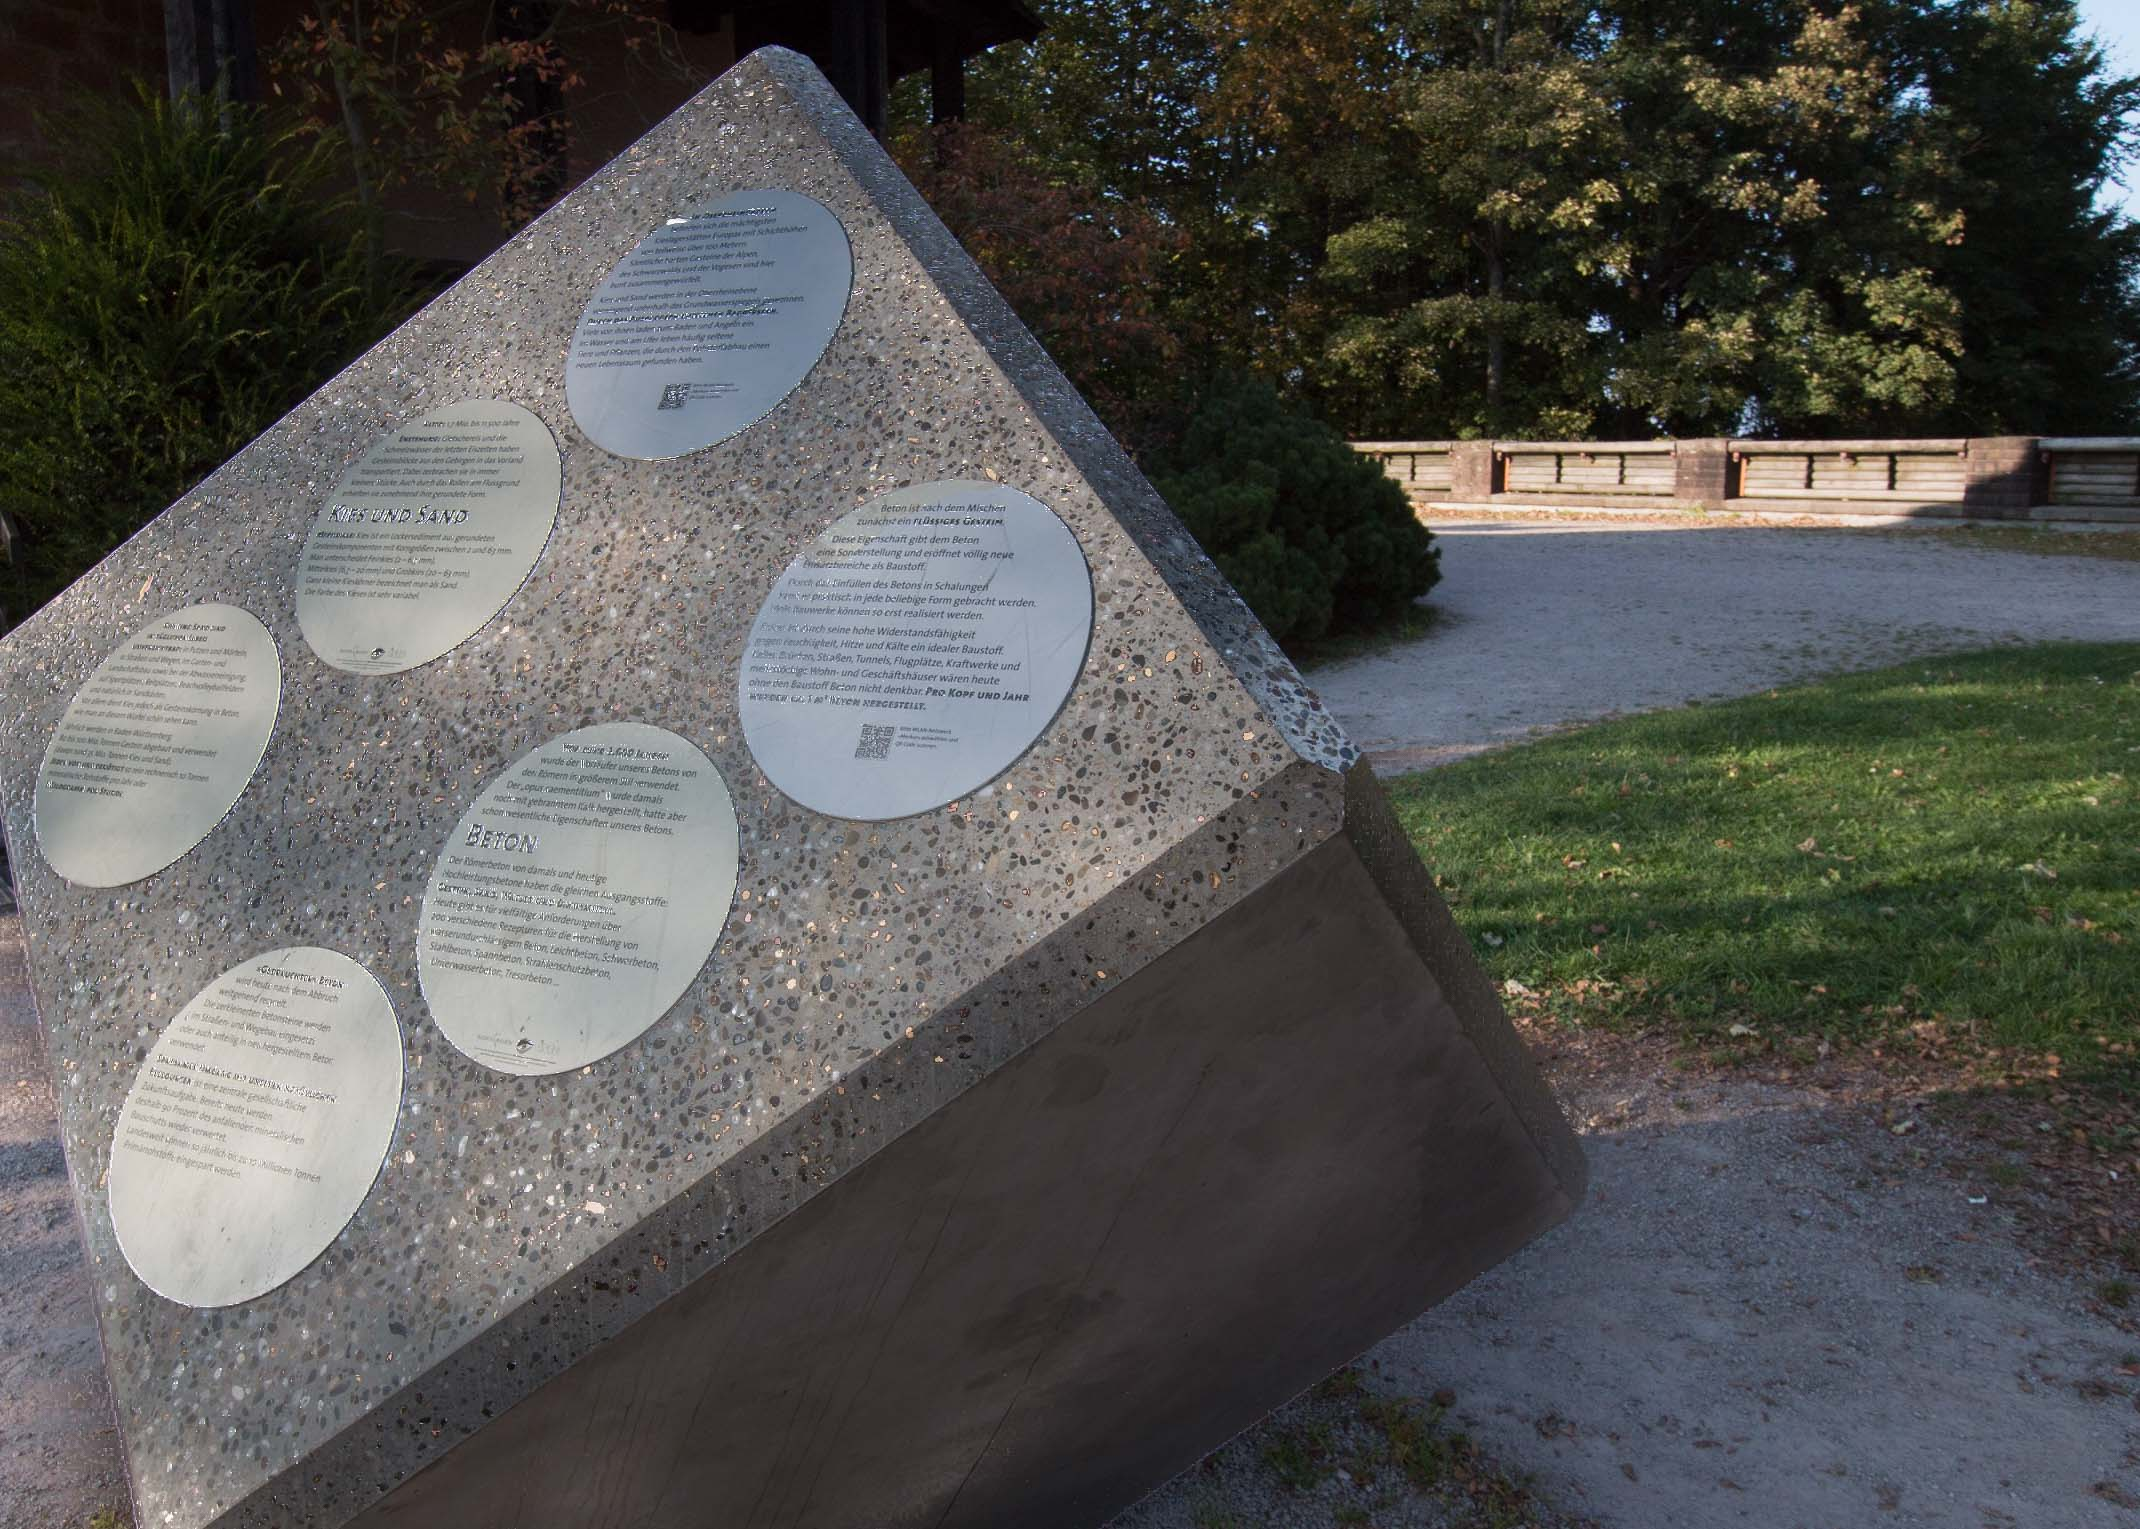 Mercury's Dice - Baden Baden, Germany - October 2014